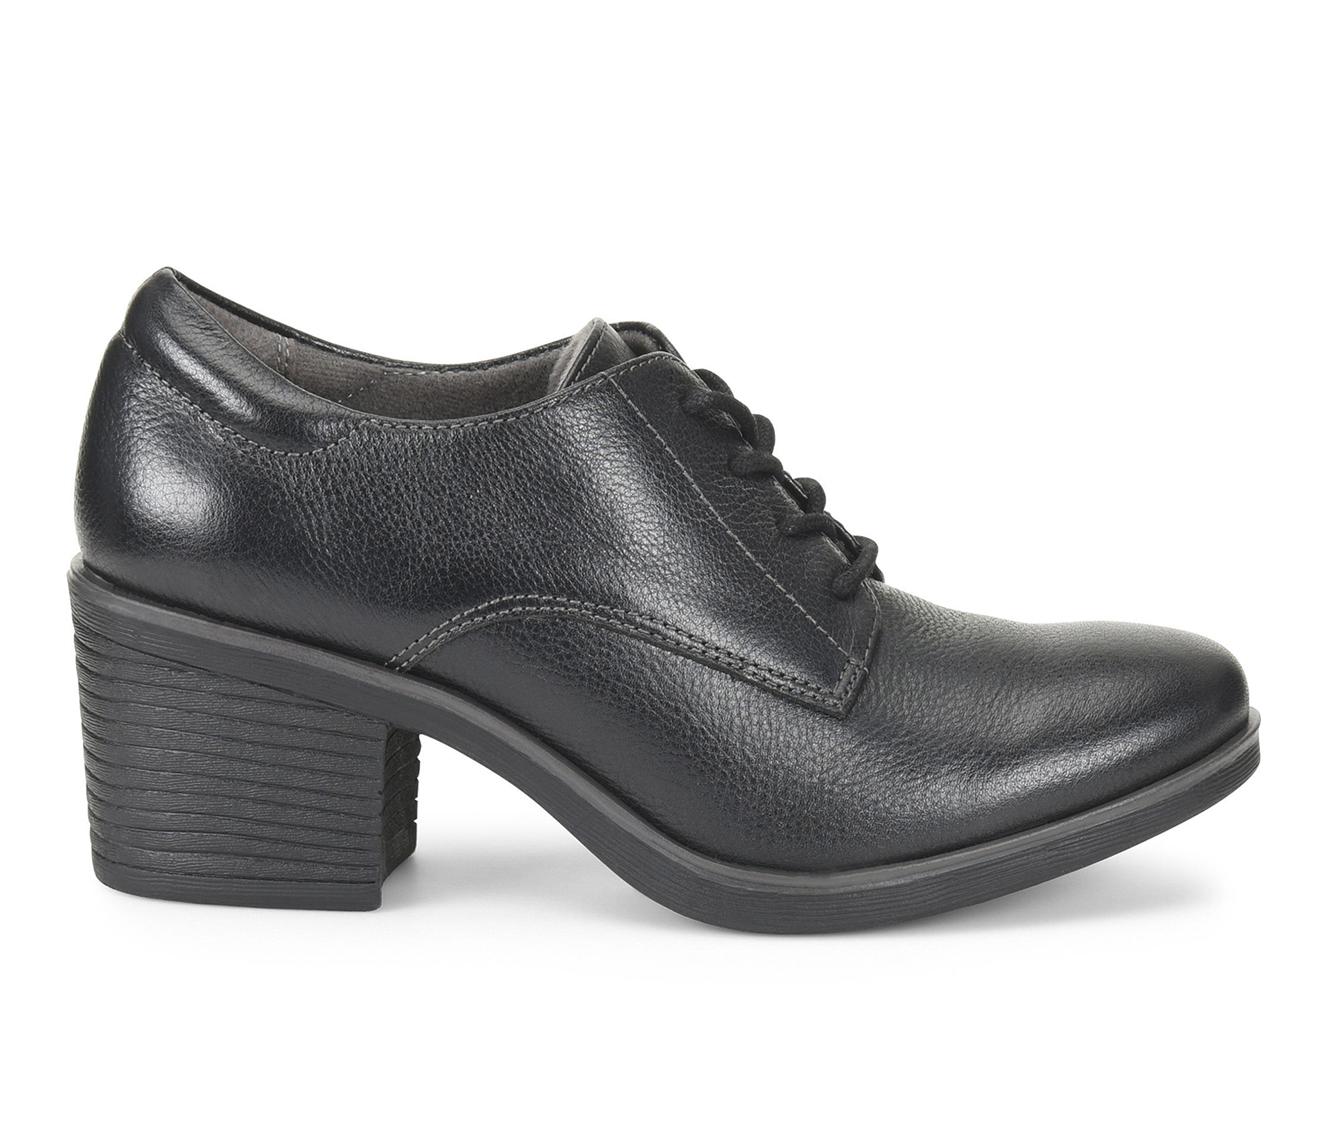 EuroSoft Jules Women's Shoe (Black Leather)